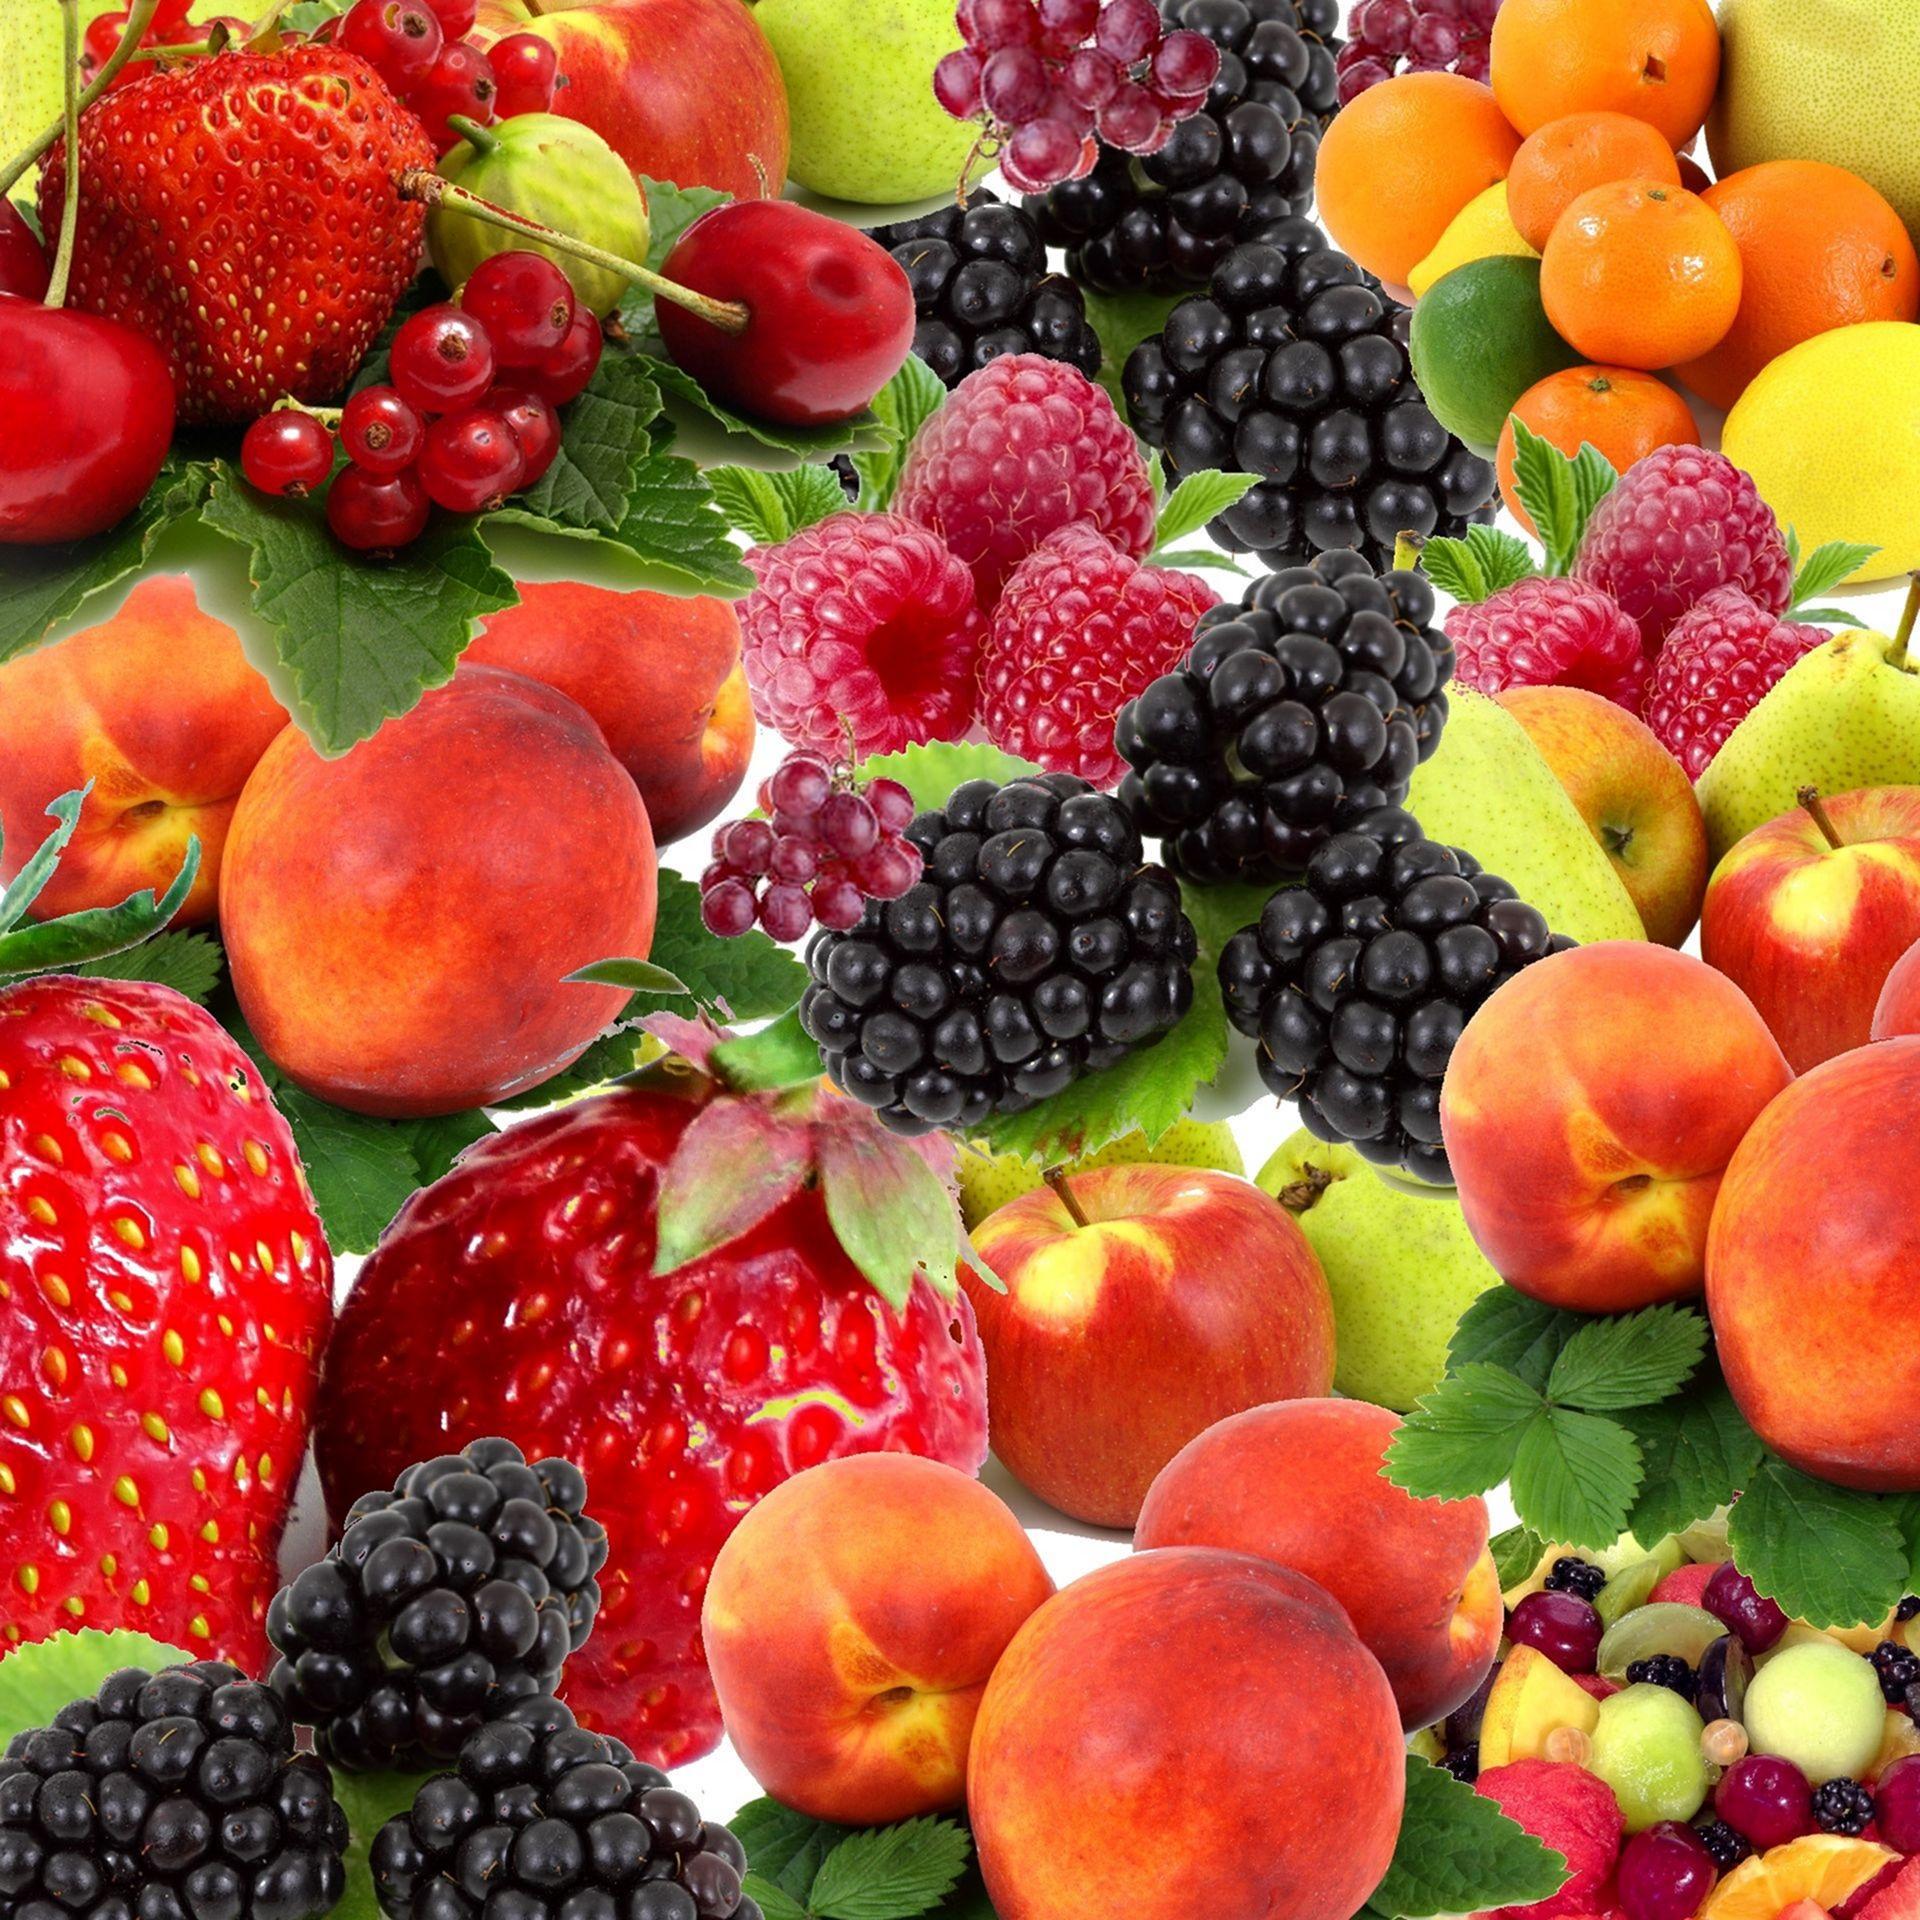 Gambar Apel Alam Menanam Anggur Frambos Jeruk Makanan